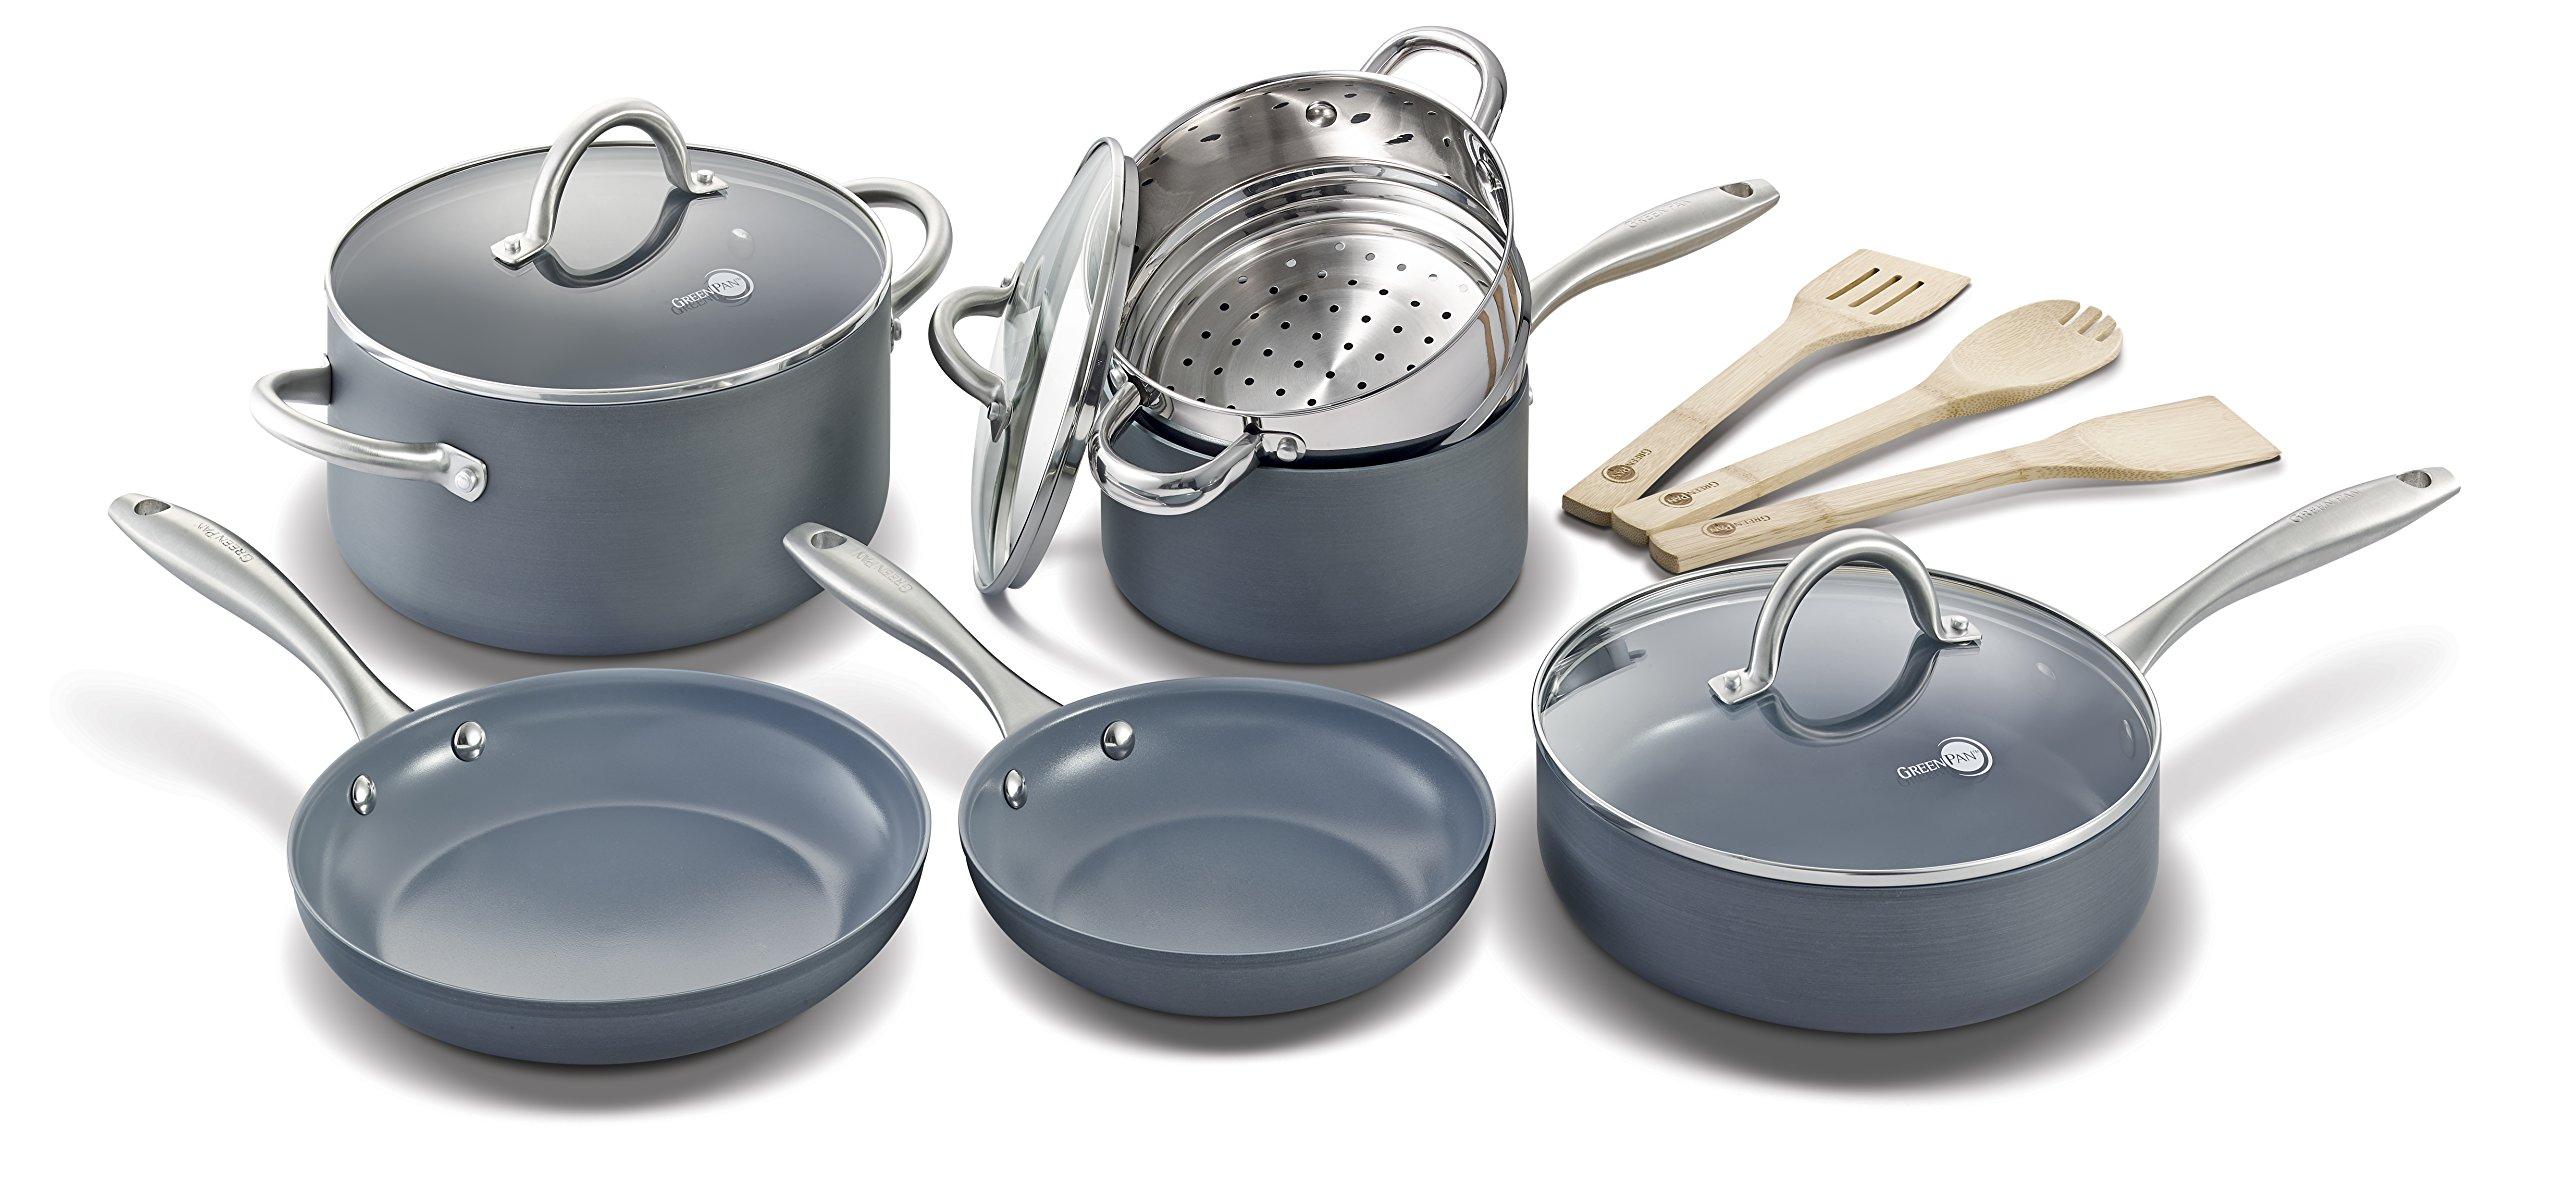 ceramic non stick frying pan pots cookware set 12pc toxic free safe ebay. Black Bedroom Furniture Sets. Home Design Ideas